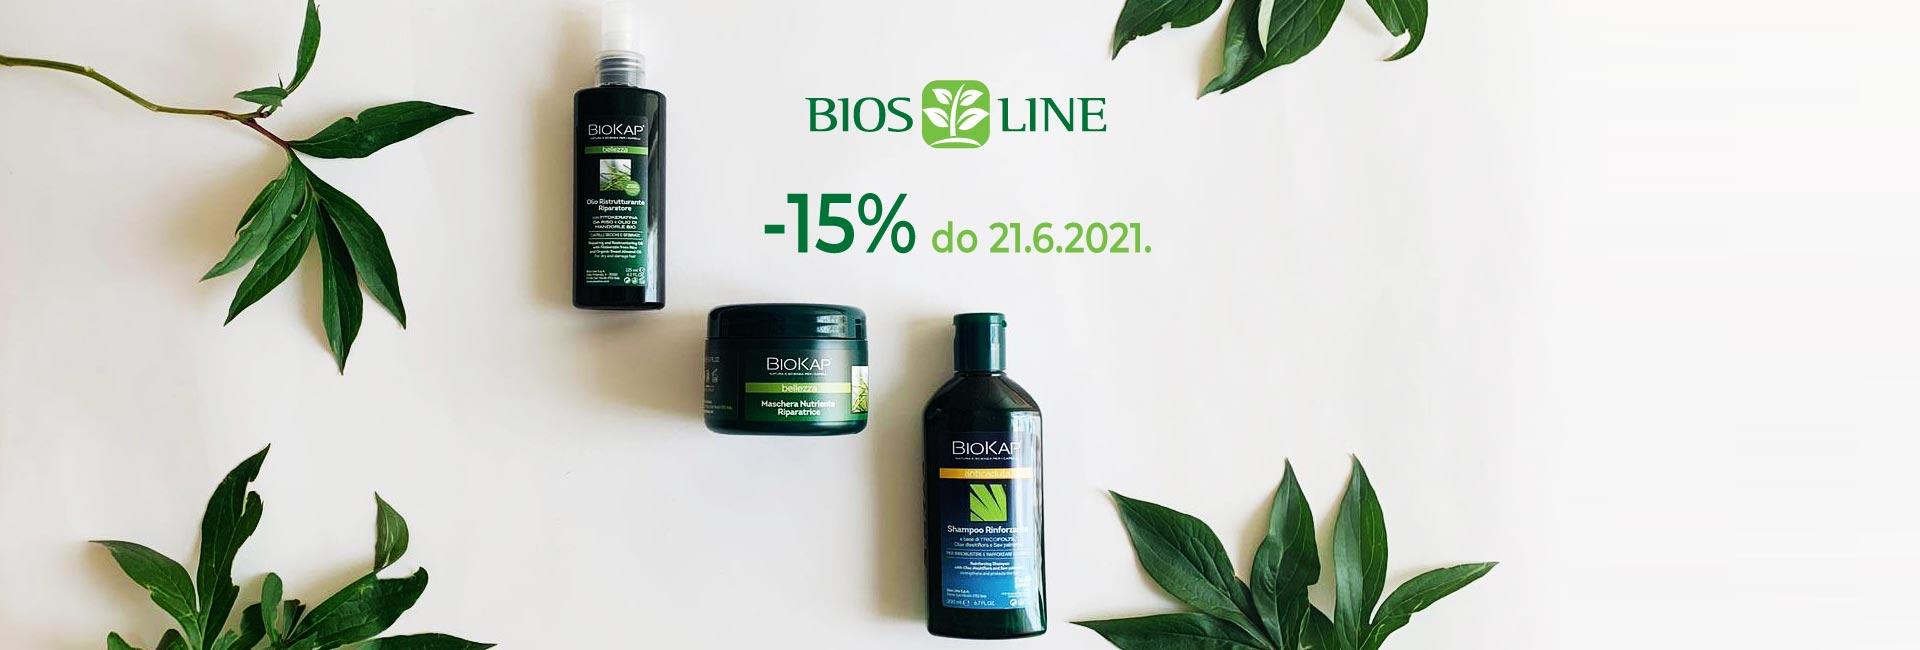 biosline -15% do 21.6.21.